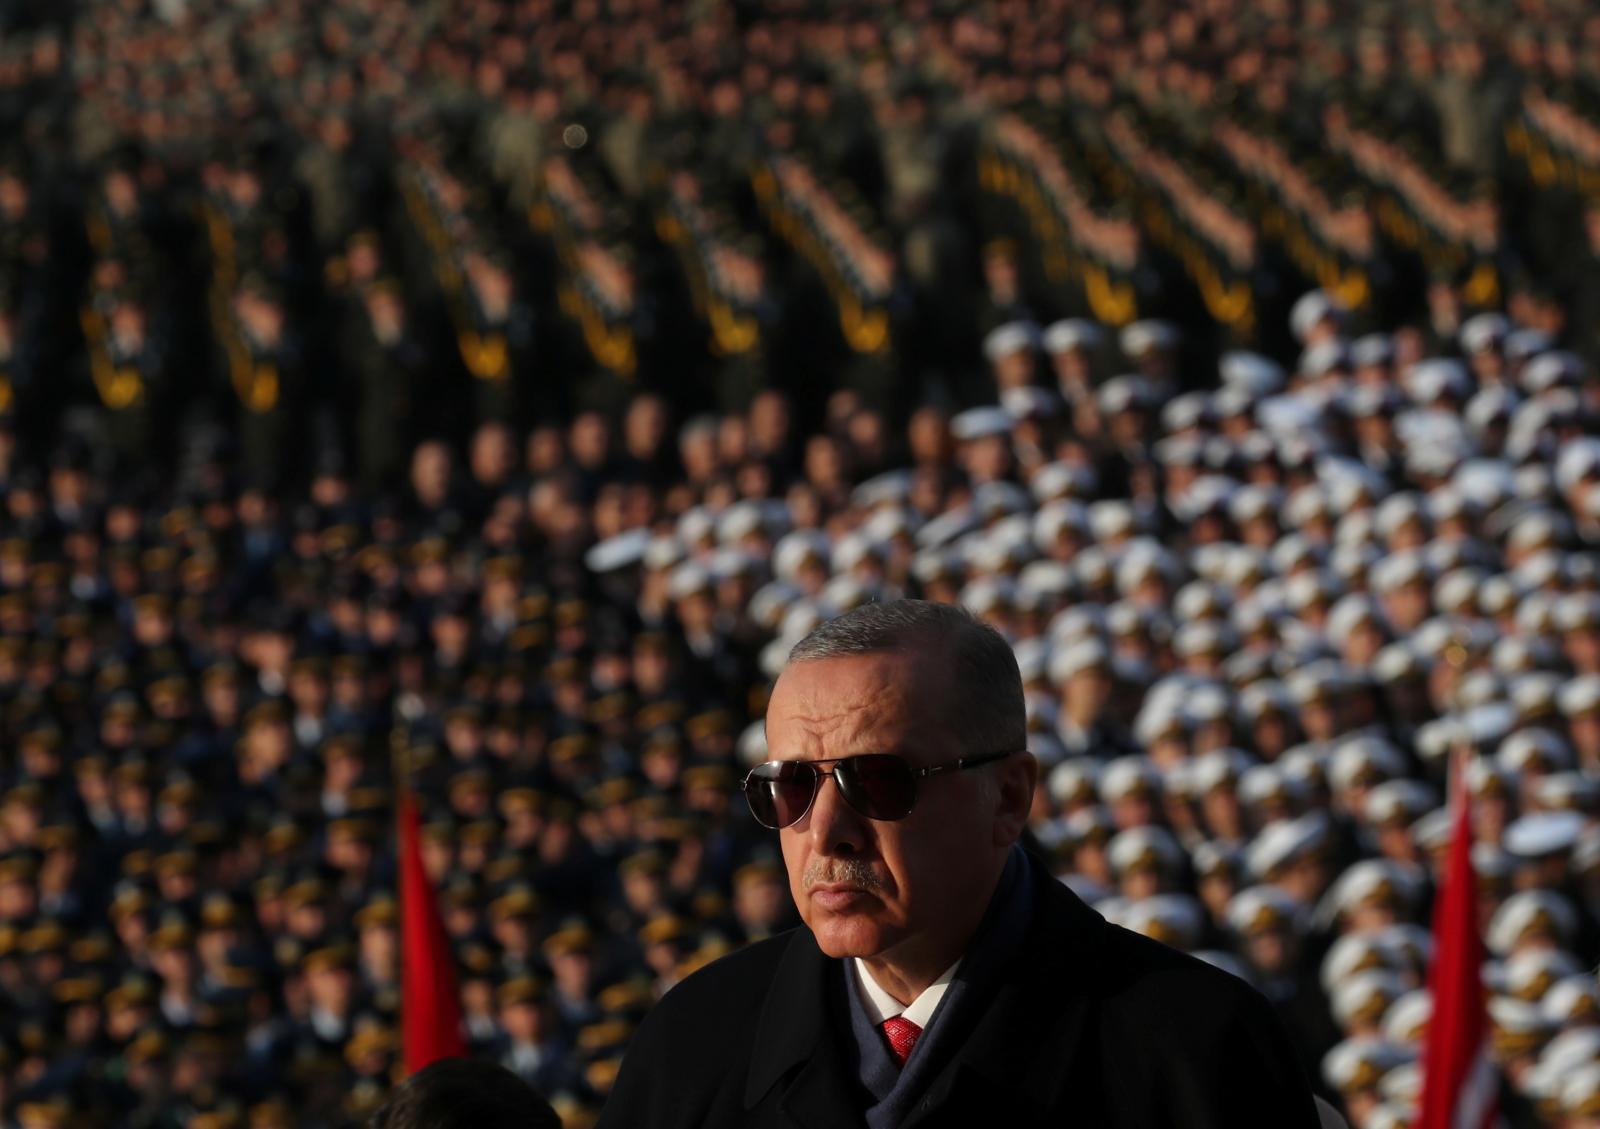 turkey s erdogan says khashoggi tapes given to key foreign nations